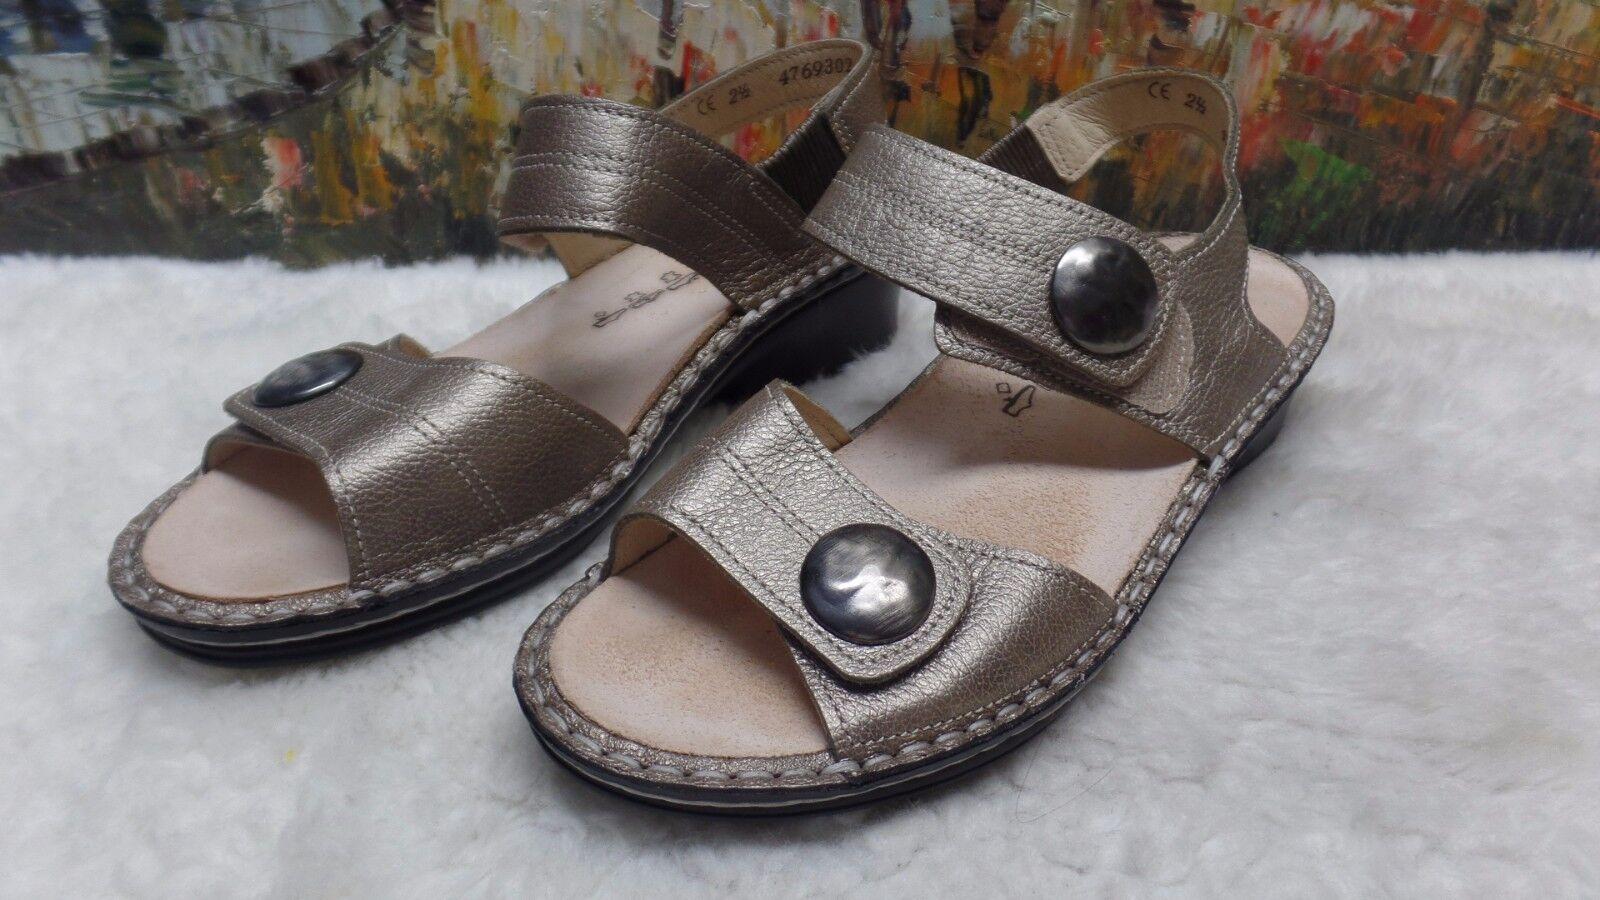 Finn Comfort 'Alanya' Sandal - Size UK 2.5  US 5 -  255